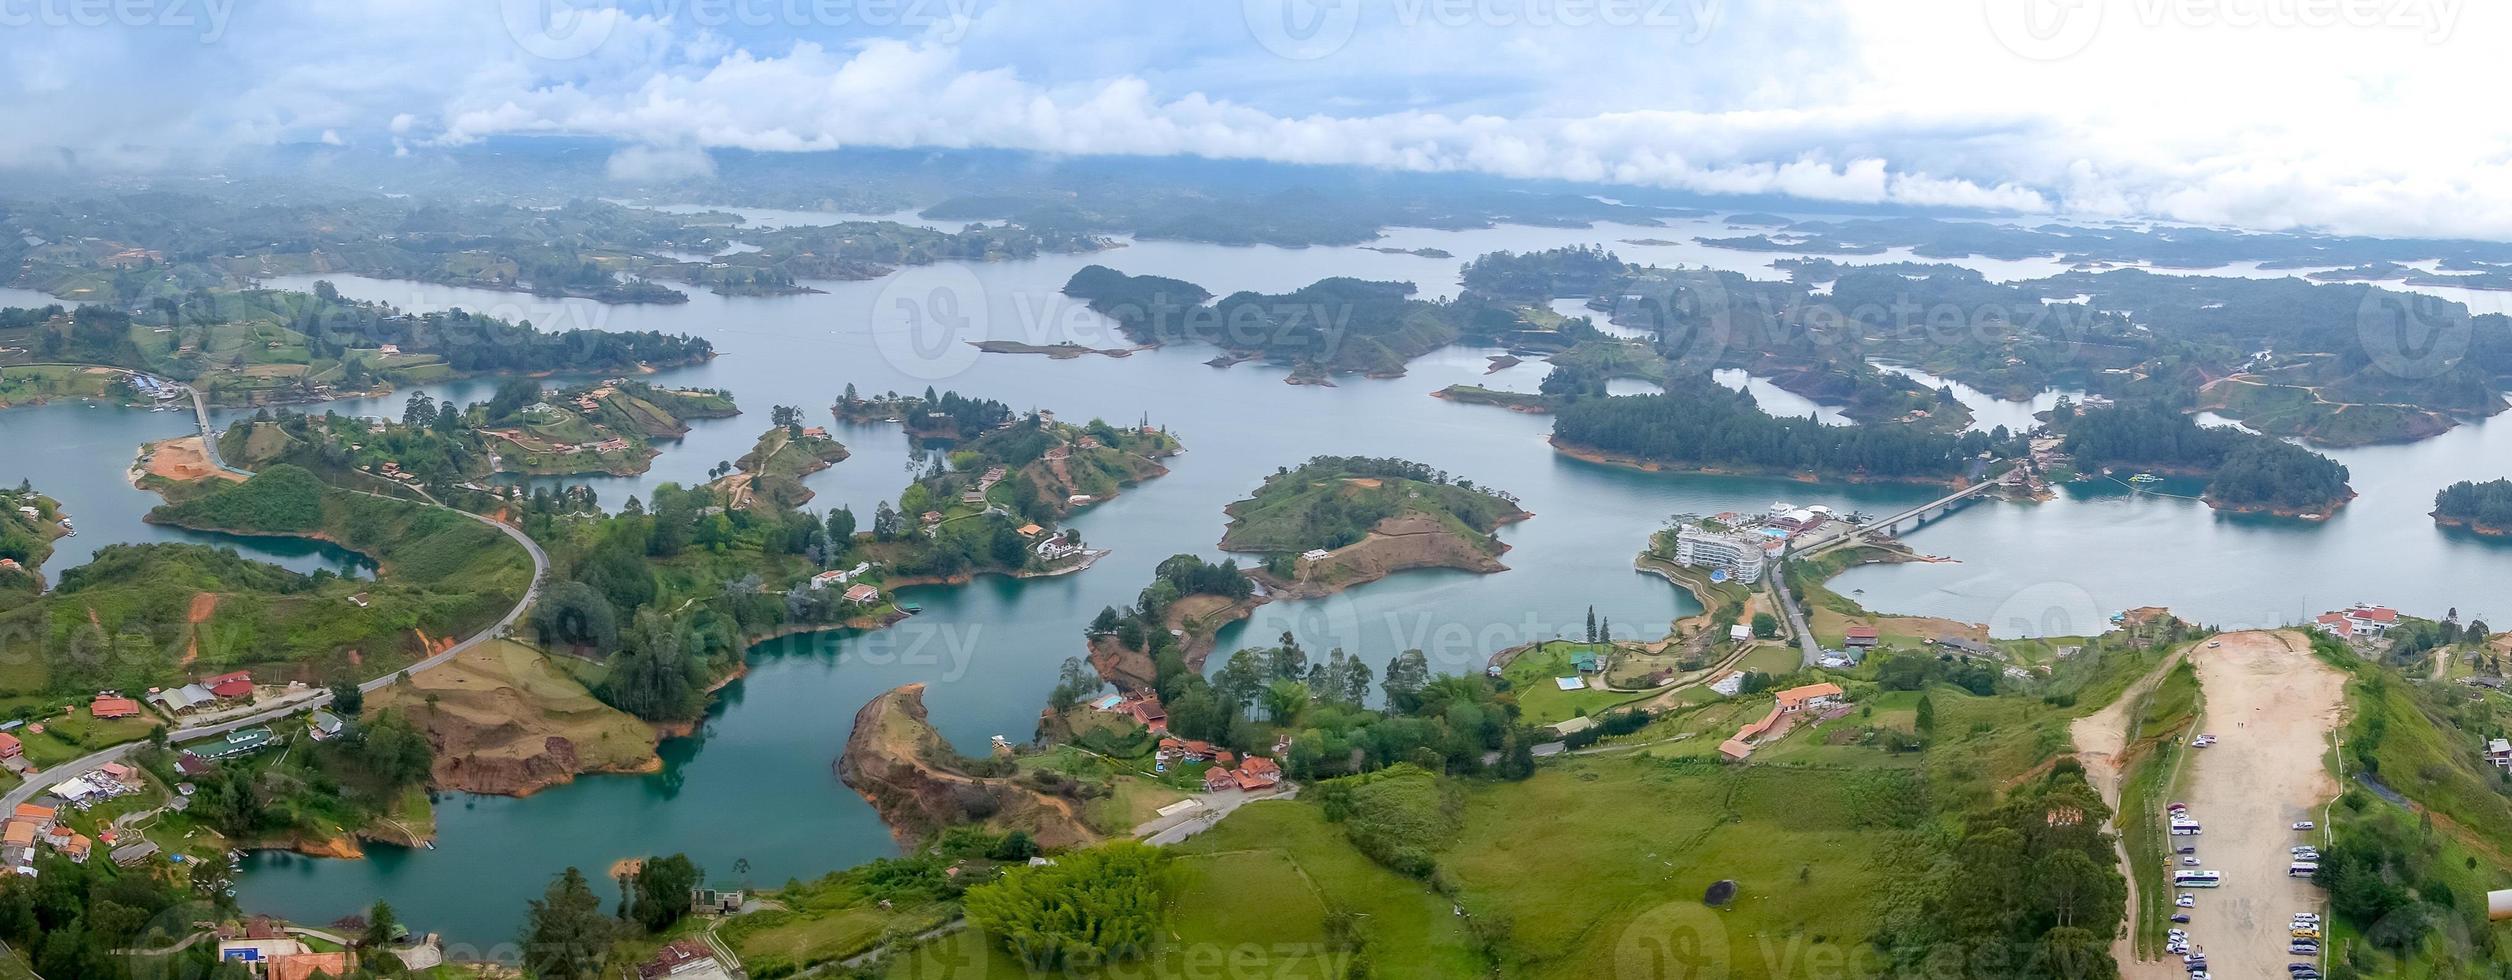 Vista aérea de guatape en antioquia, colombia foto